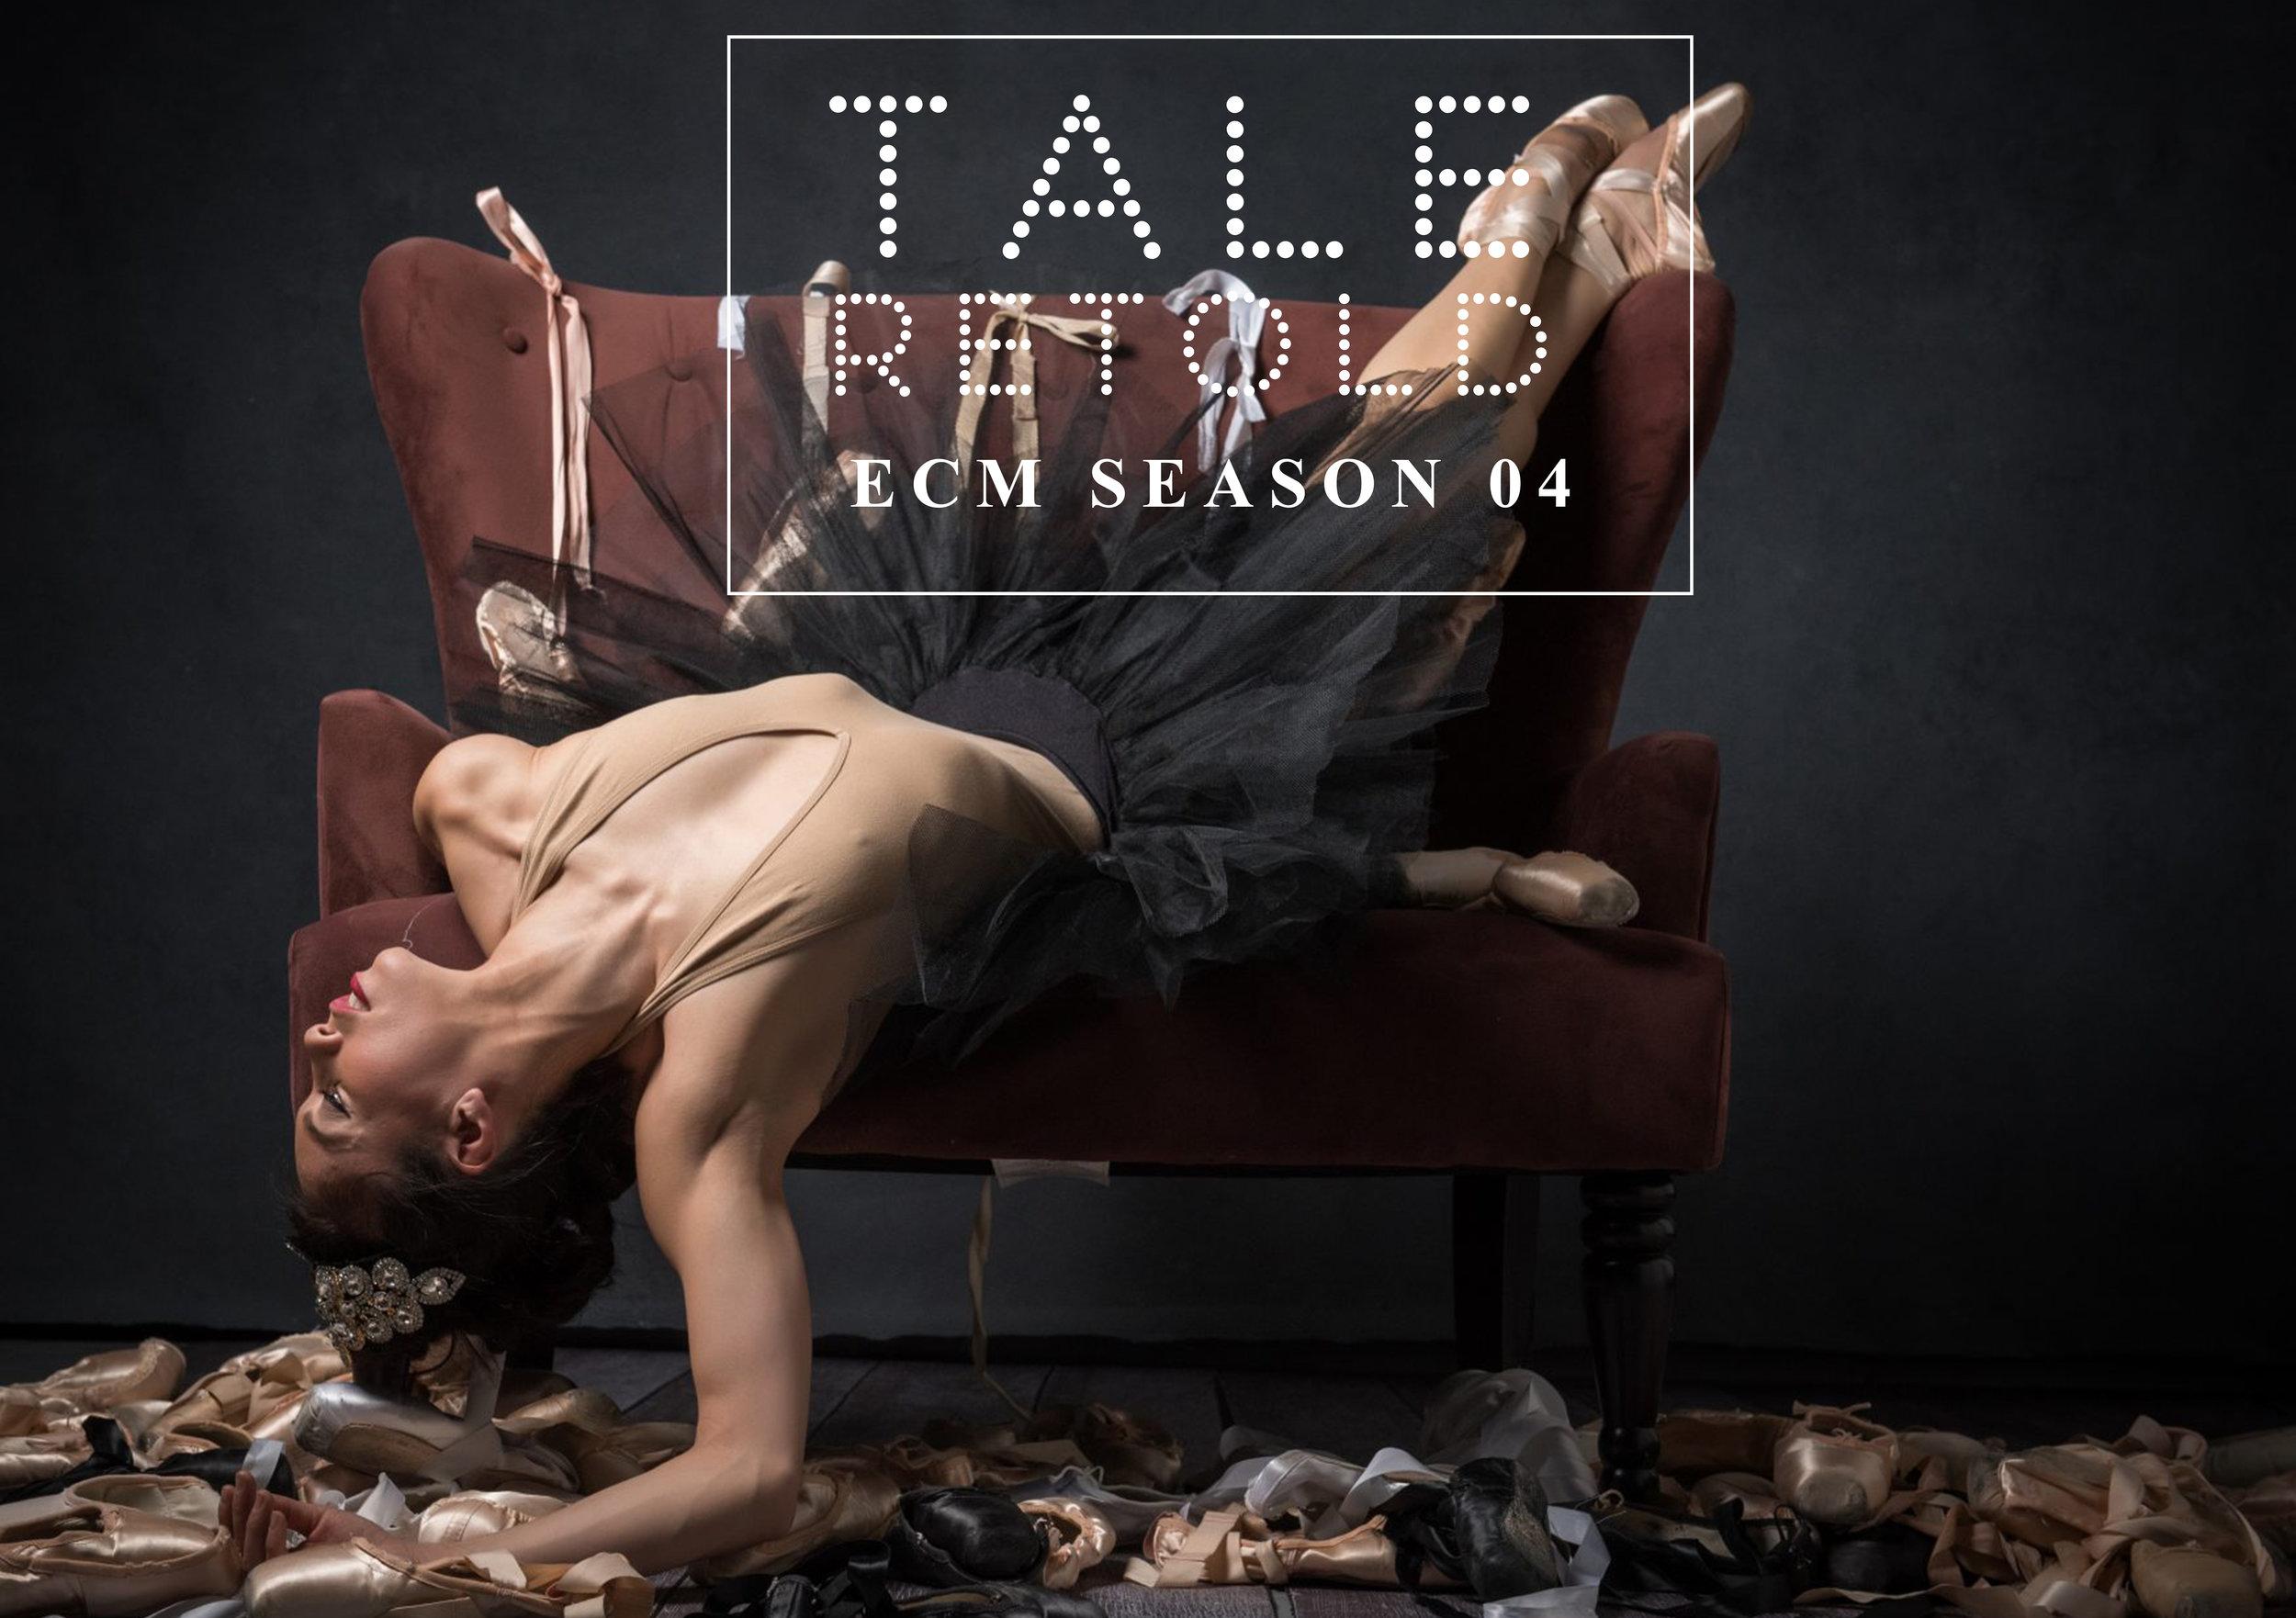 taleretold season 04 NEW.jpg